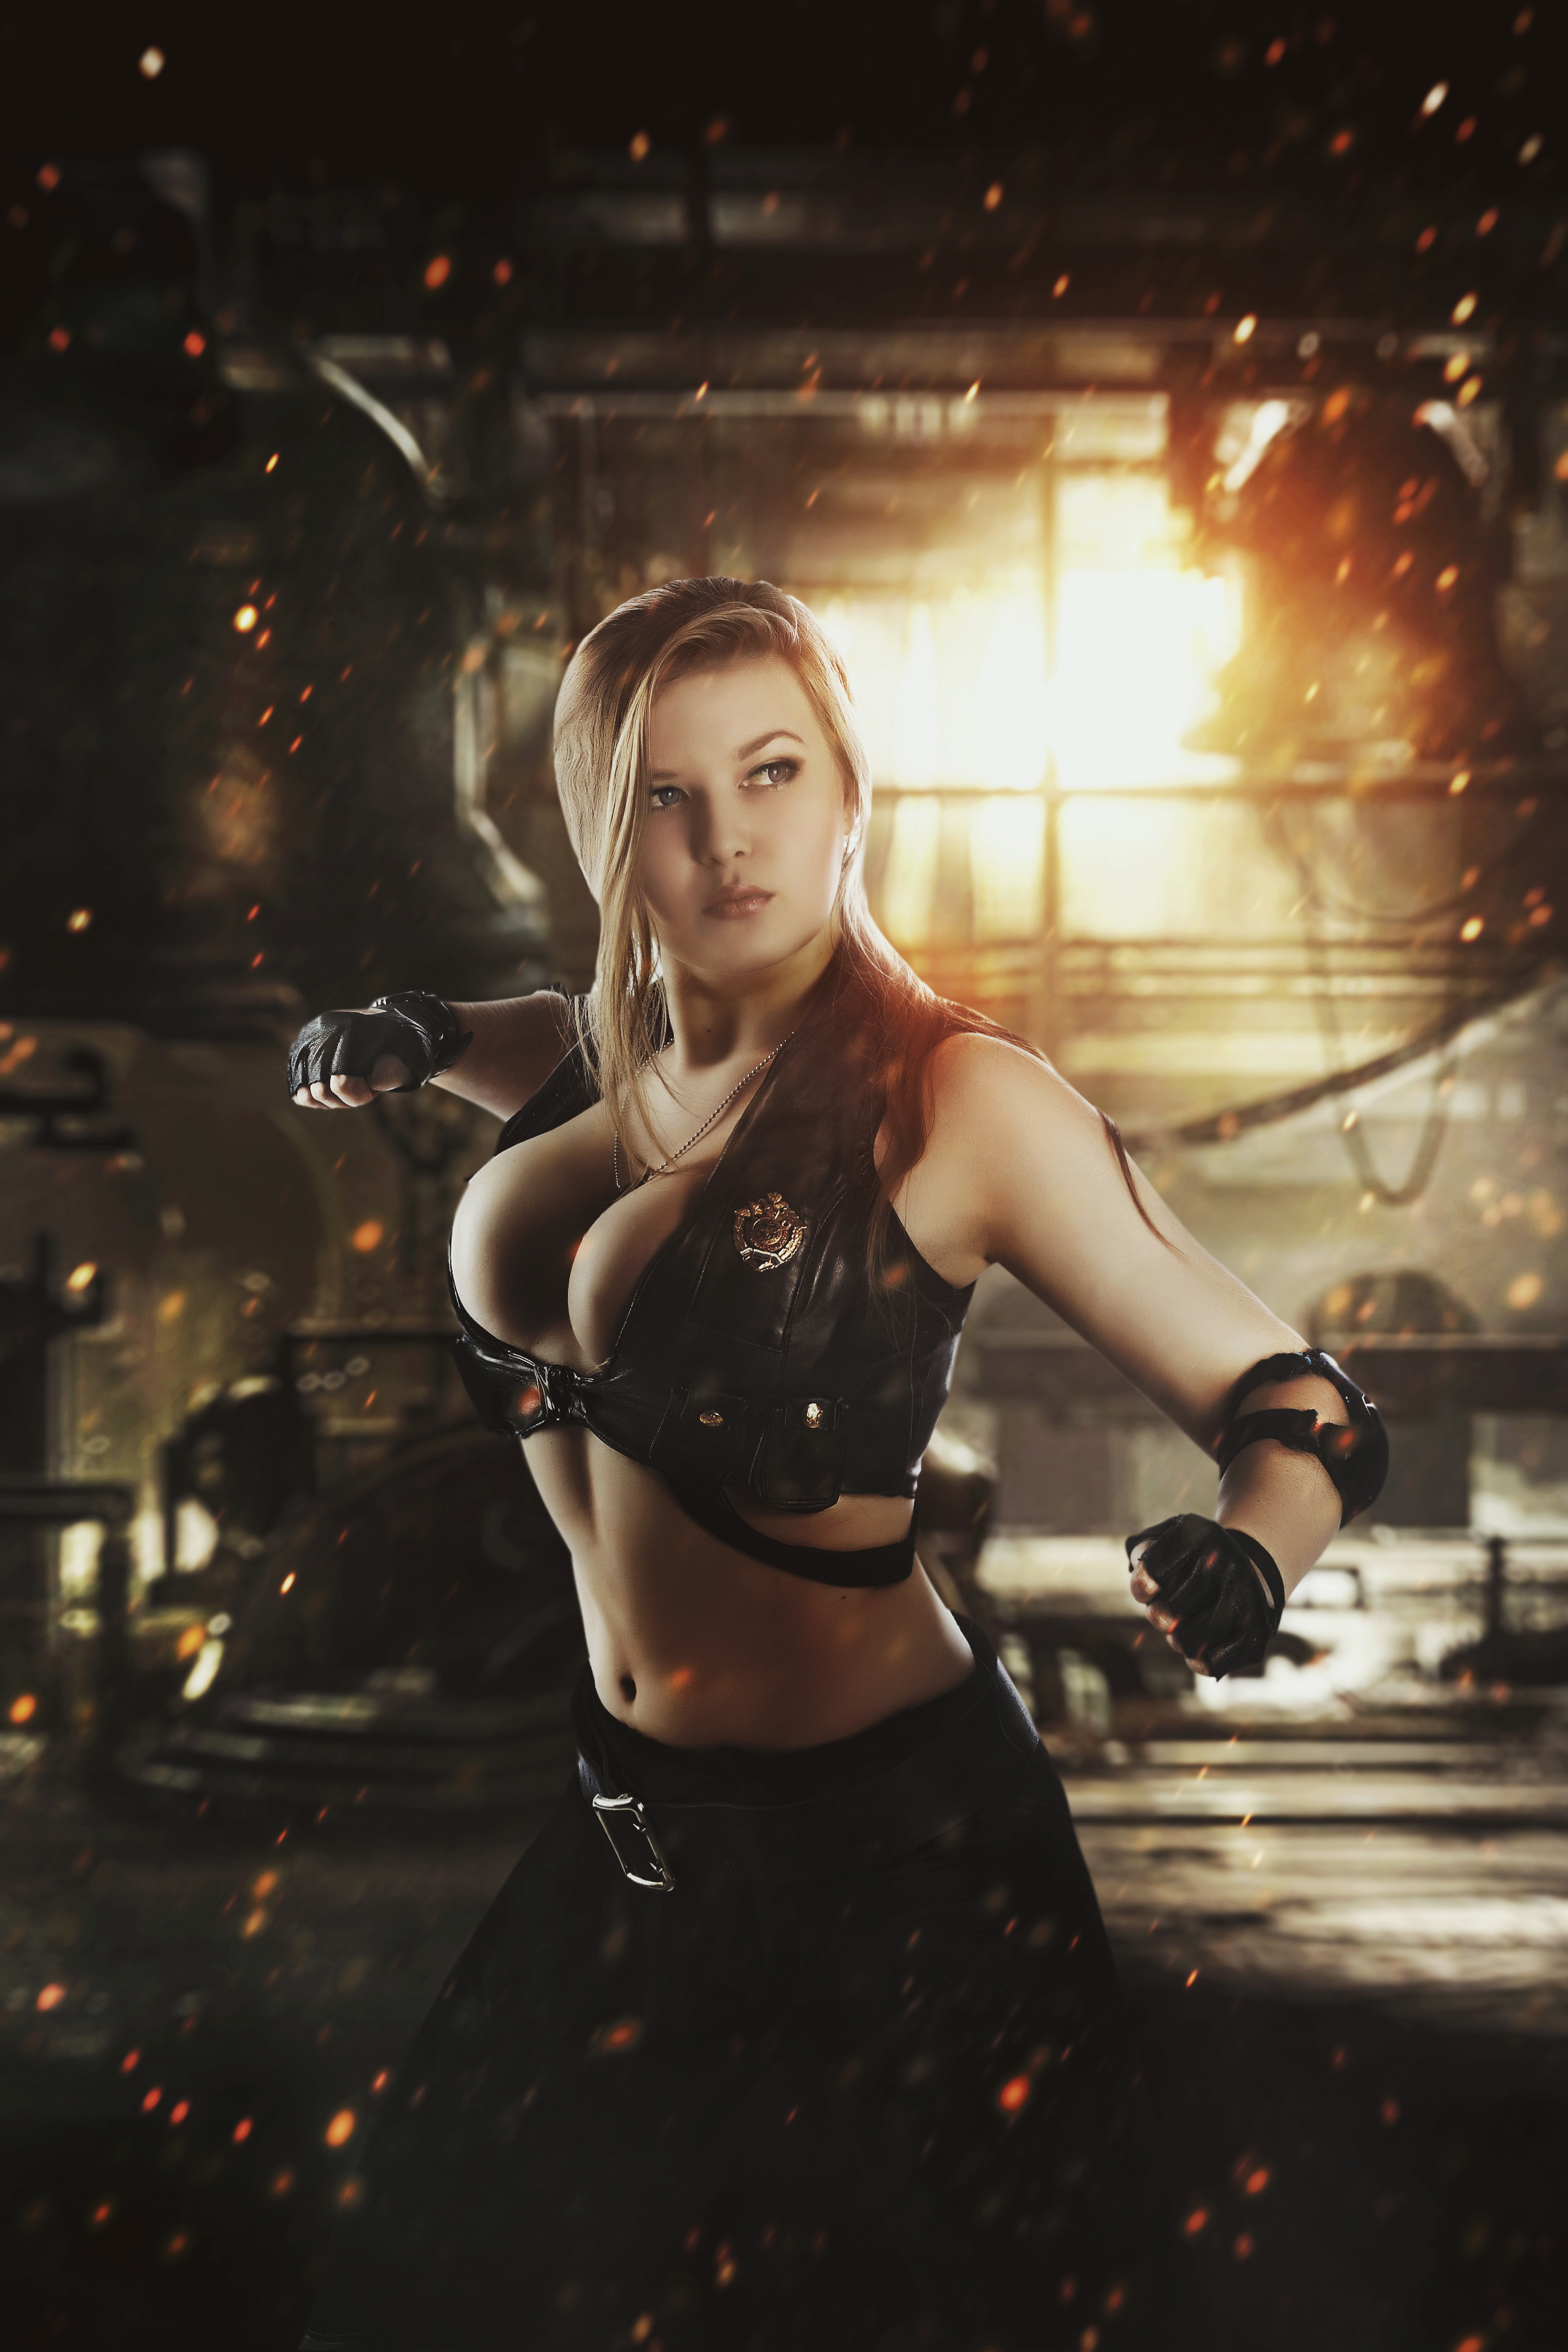 Mortal Kombat 9, Sonya Blade, Sonya (Mortal Kombat), Mortal Kombat, игры, косплей, cosplay, Oksana Orlova, Оксана Орлова